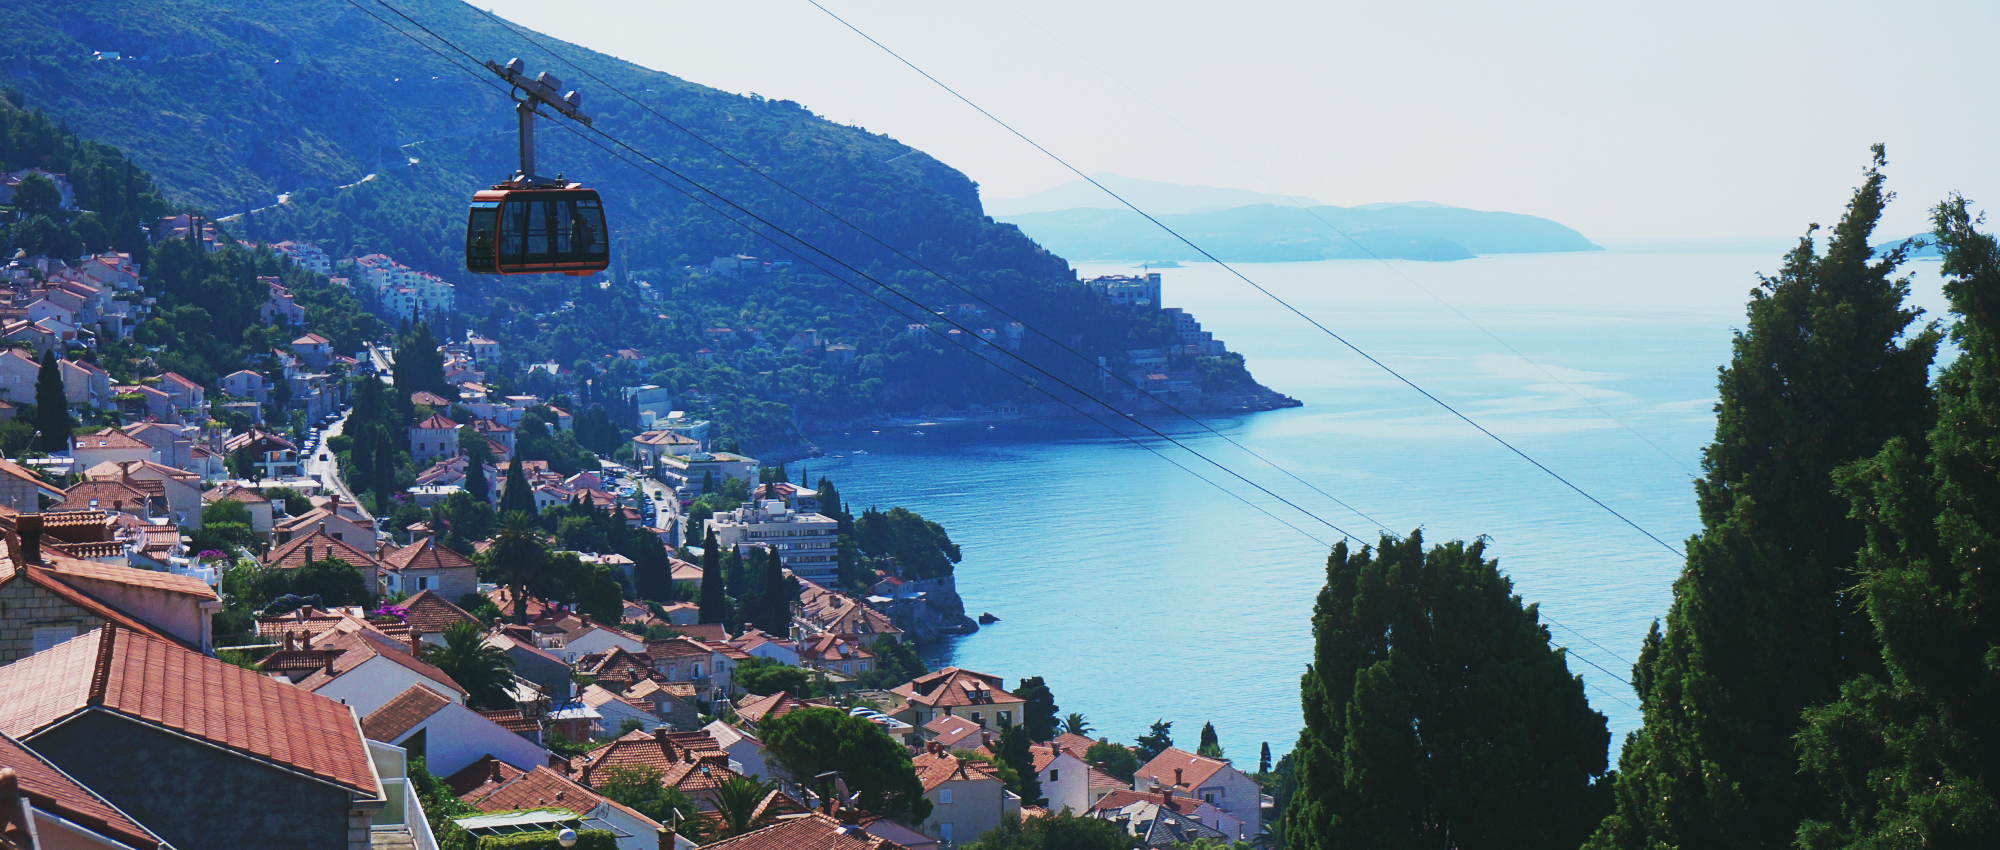 Fantasiresor i Dubrovnik